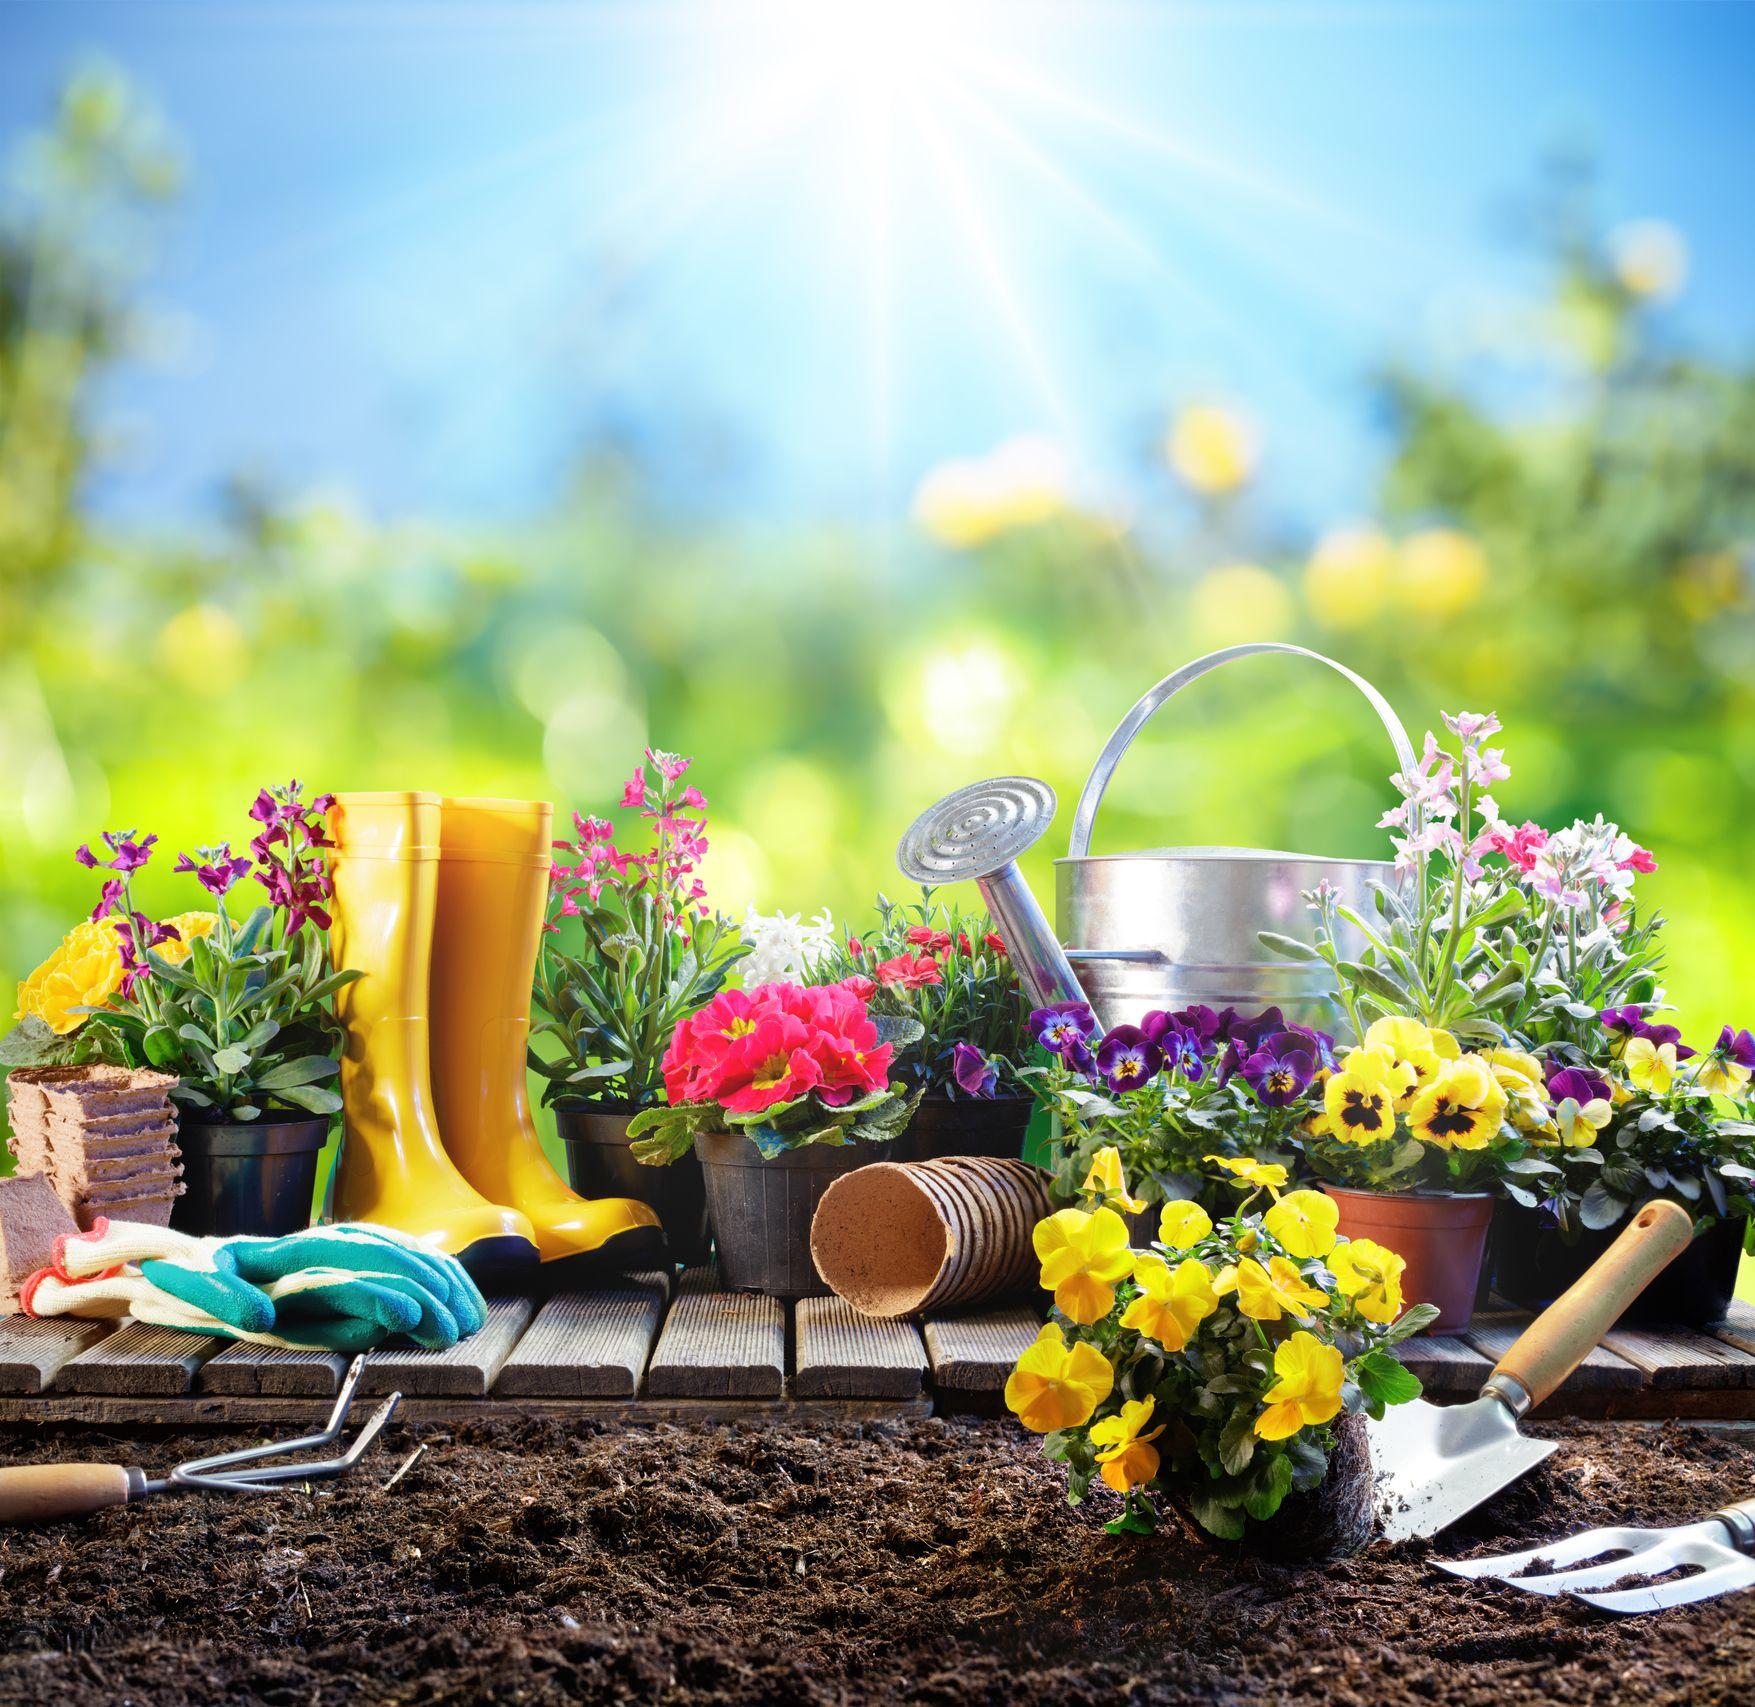 7 Health Benefits Of Gardening Get Healthy While Gardening